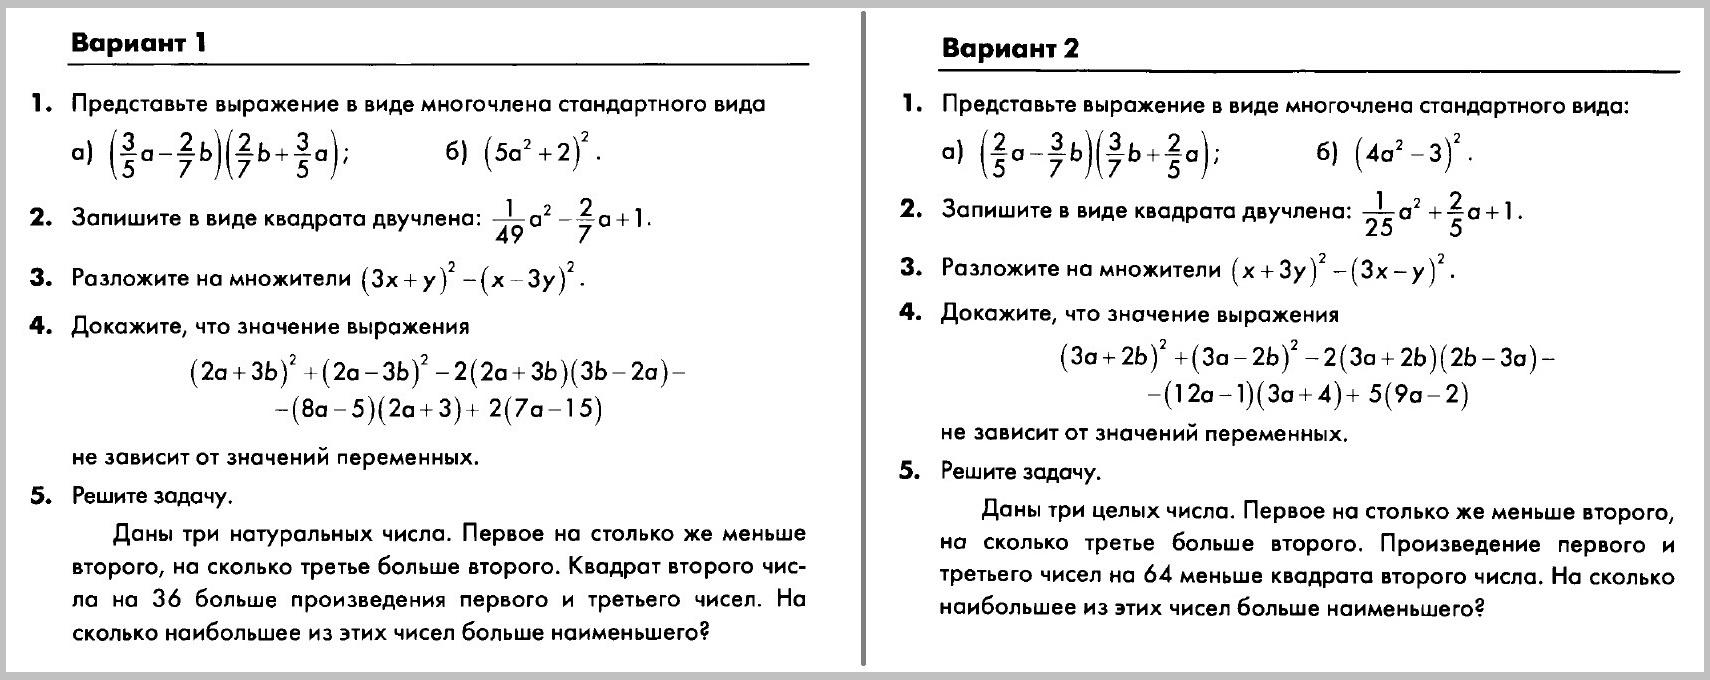 Алгебра 7 Макарычев - КИМ Глазков КР-07